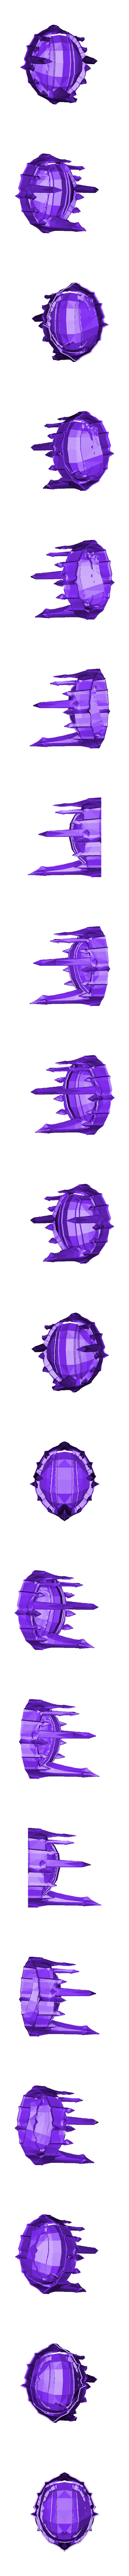 Sauron_Armor-_Helmet_Top.stl Download free STL file Sauron Armor - Helmet • 3D printable template, arifsethi